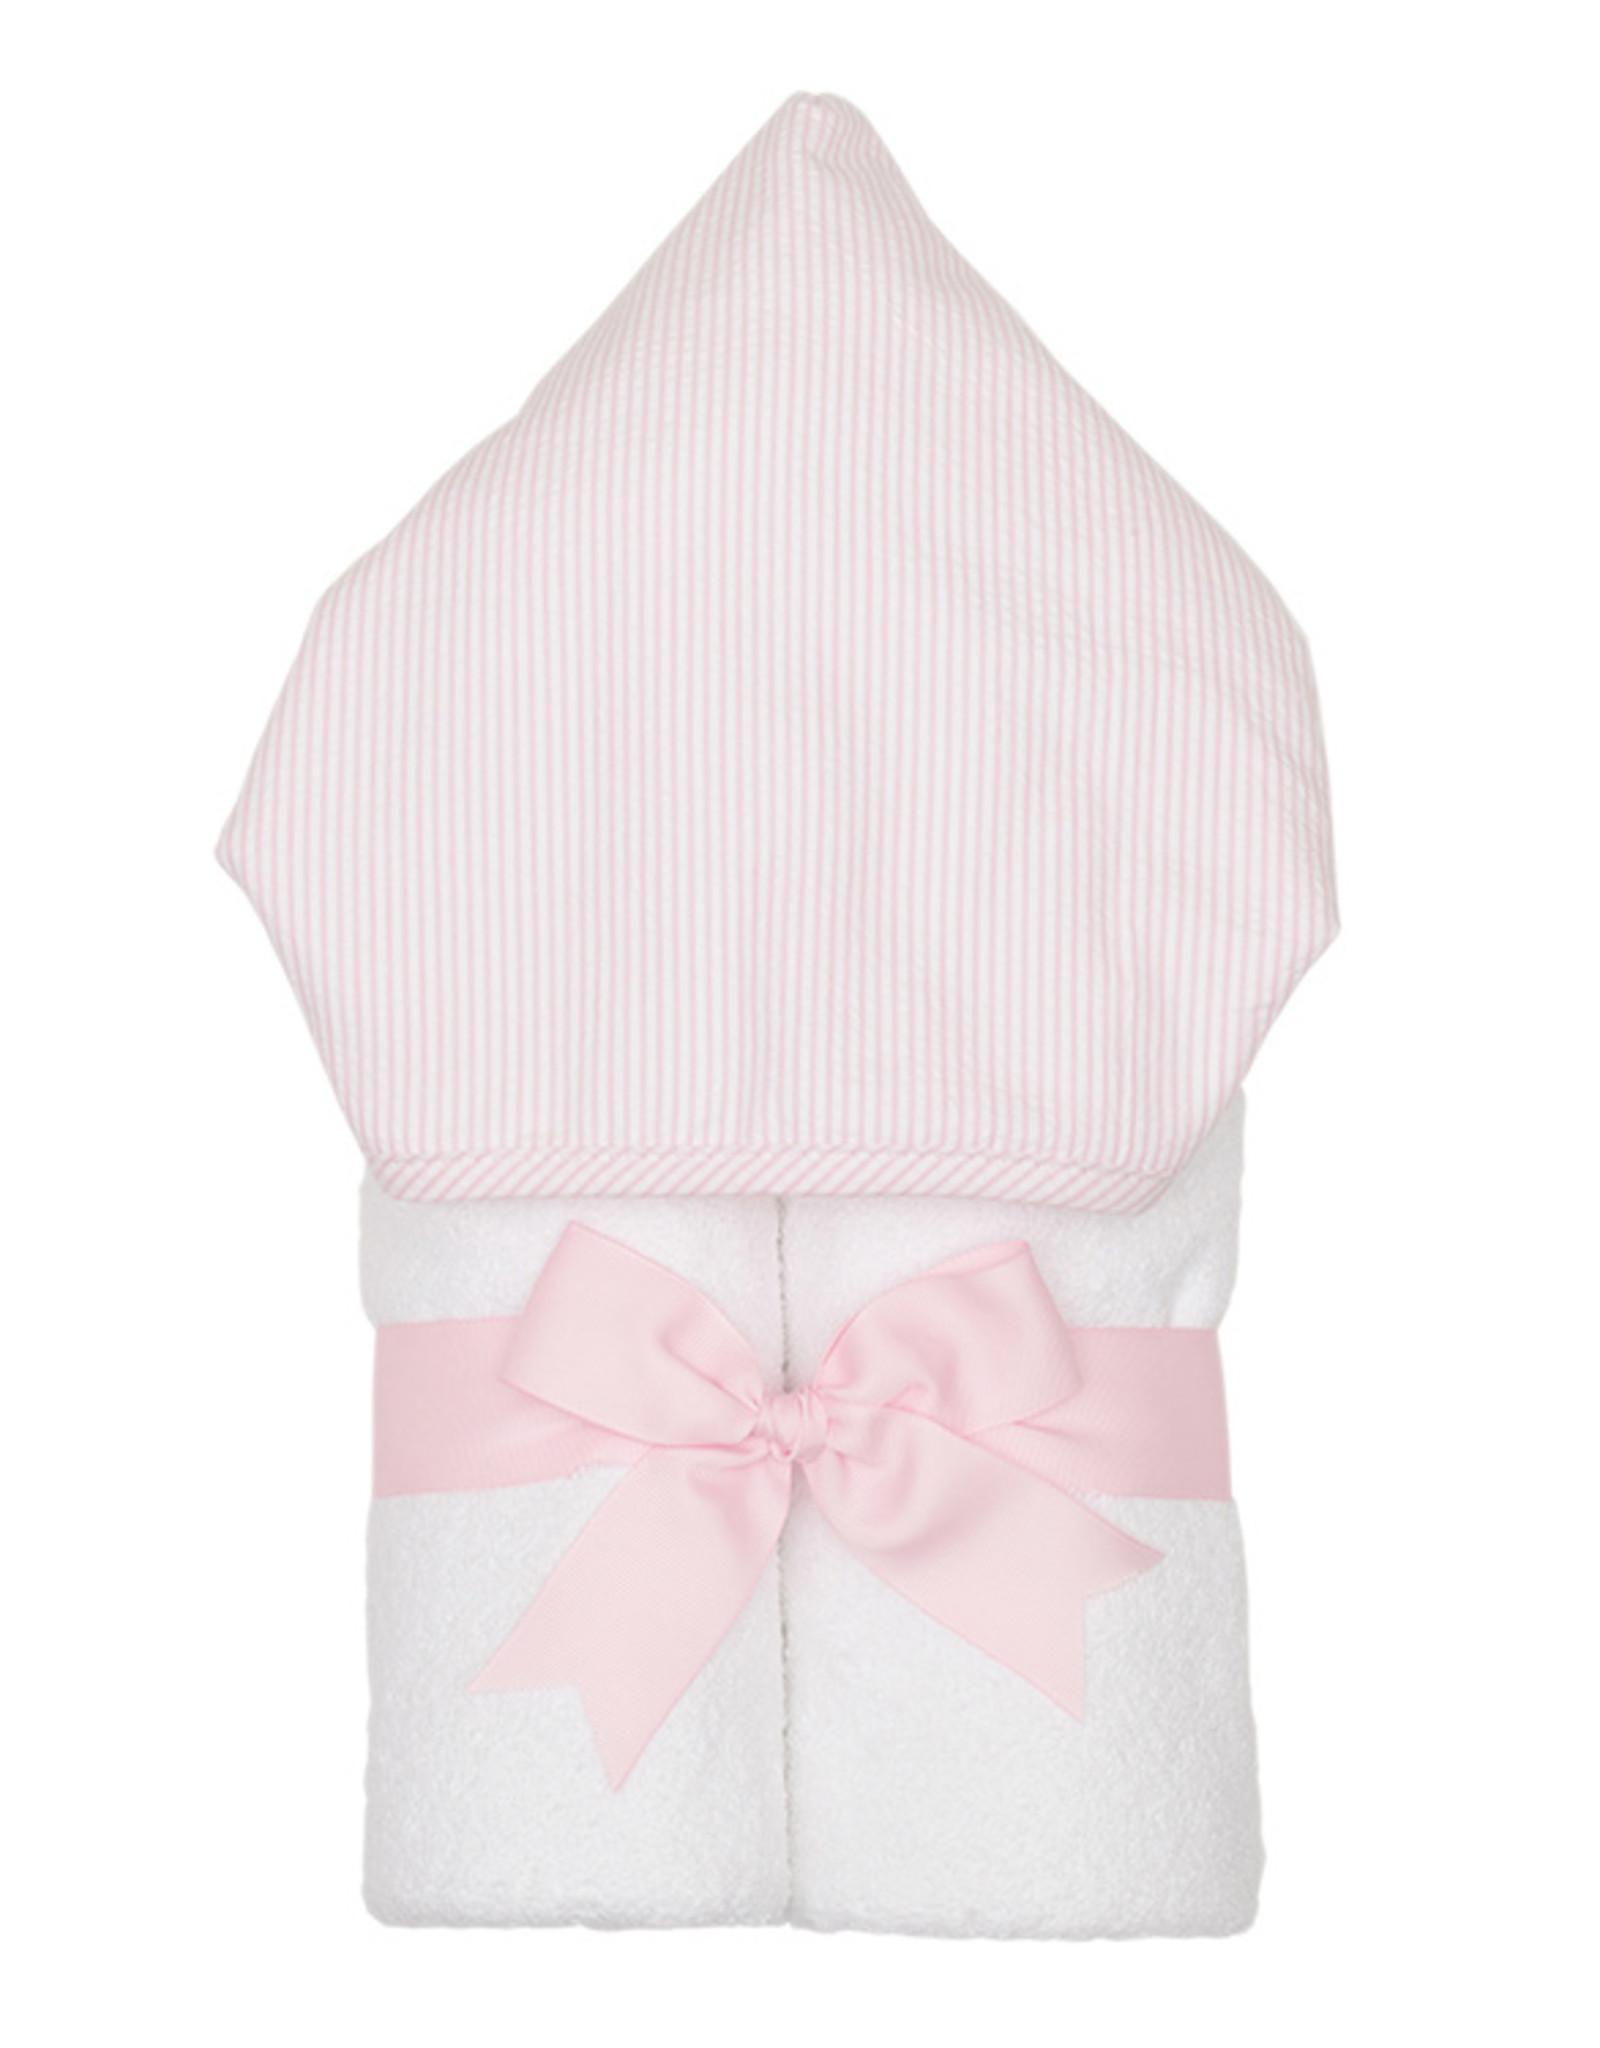 Three Marthas Everykid Towel Pink Seersucker